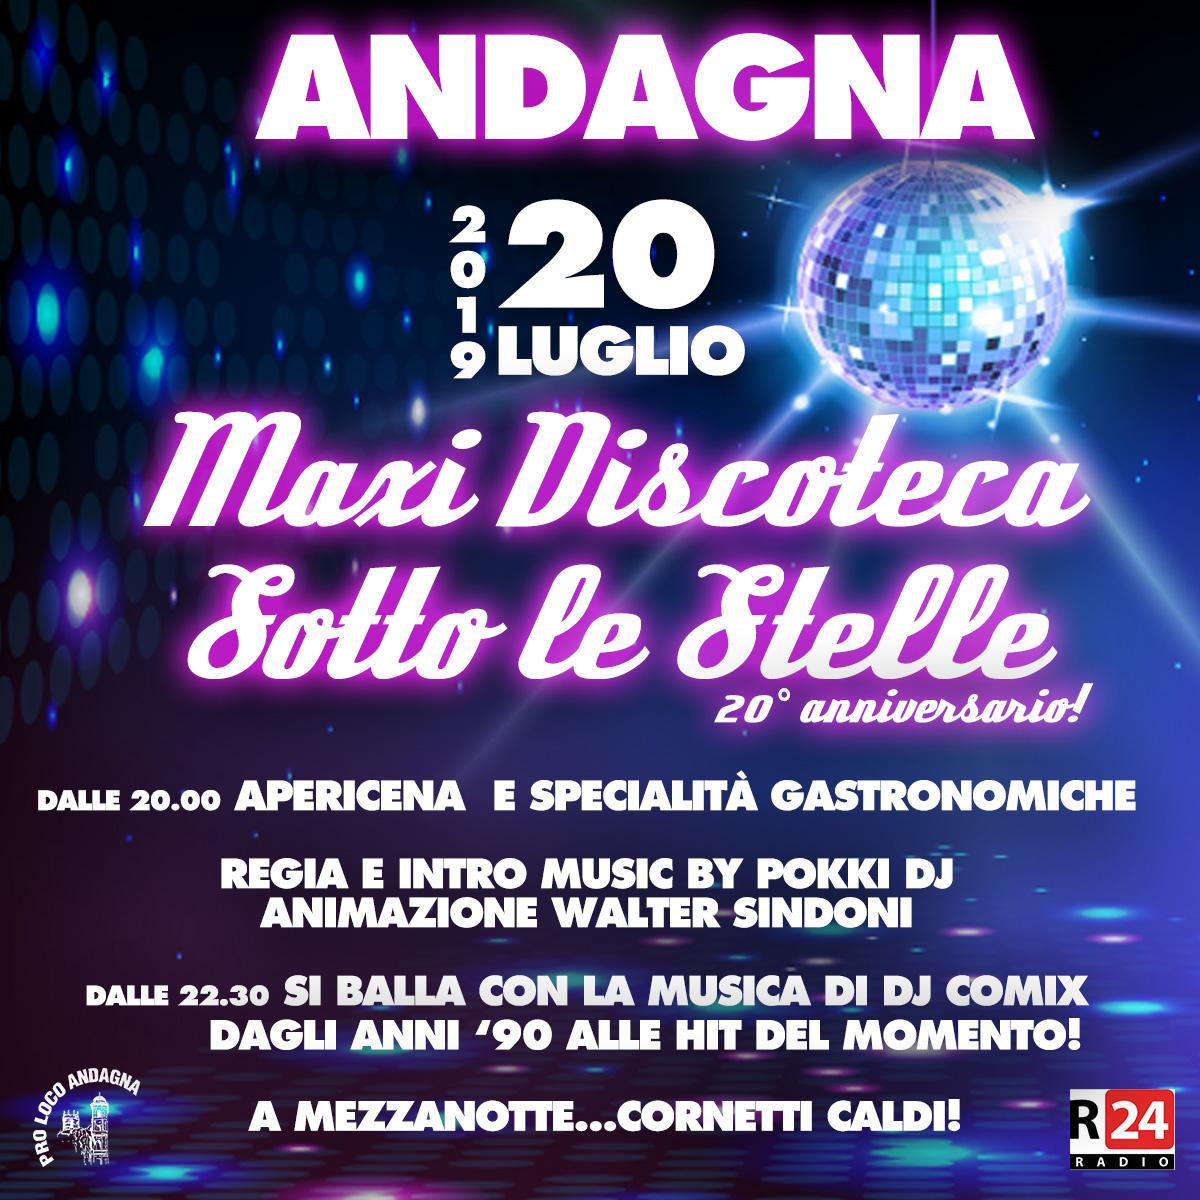 Maxi Discoteca Andagna